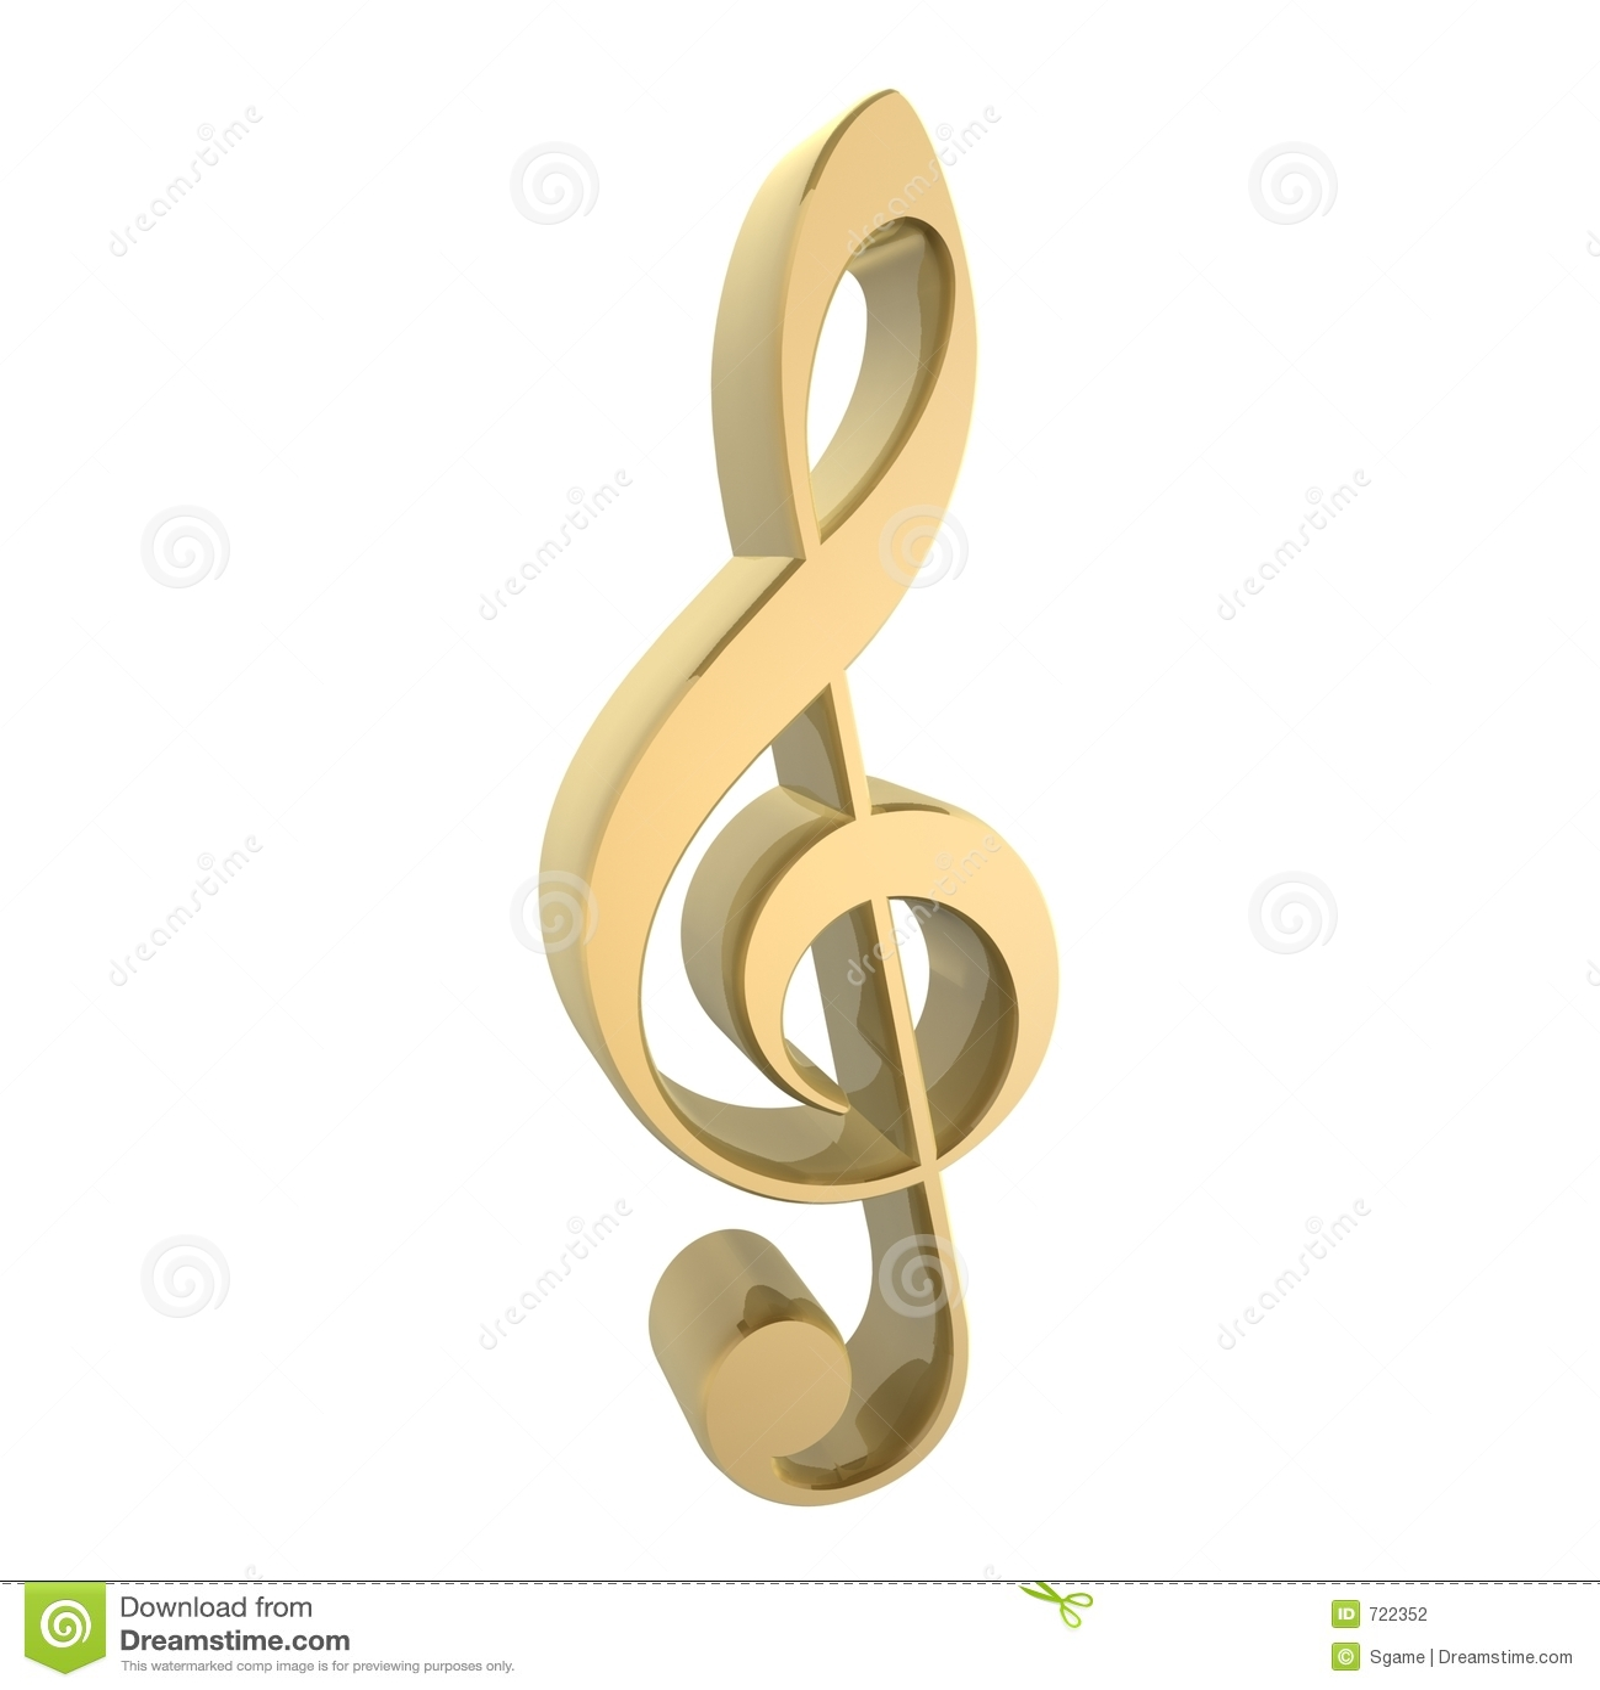 Music symbol stock illustration illustration of shapes 722352 music symbol biocorpaavc